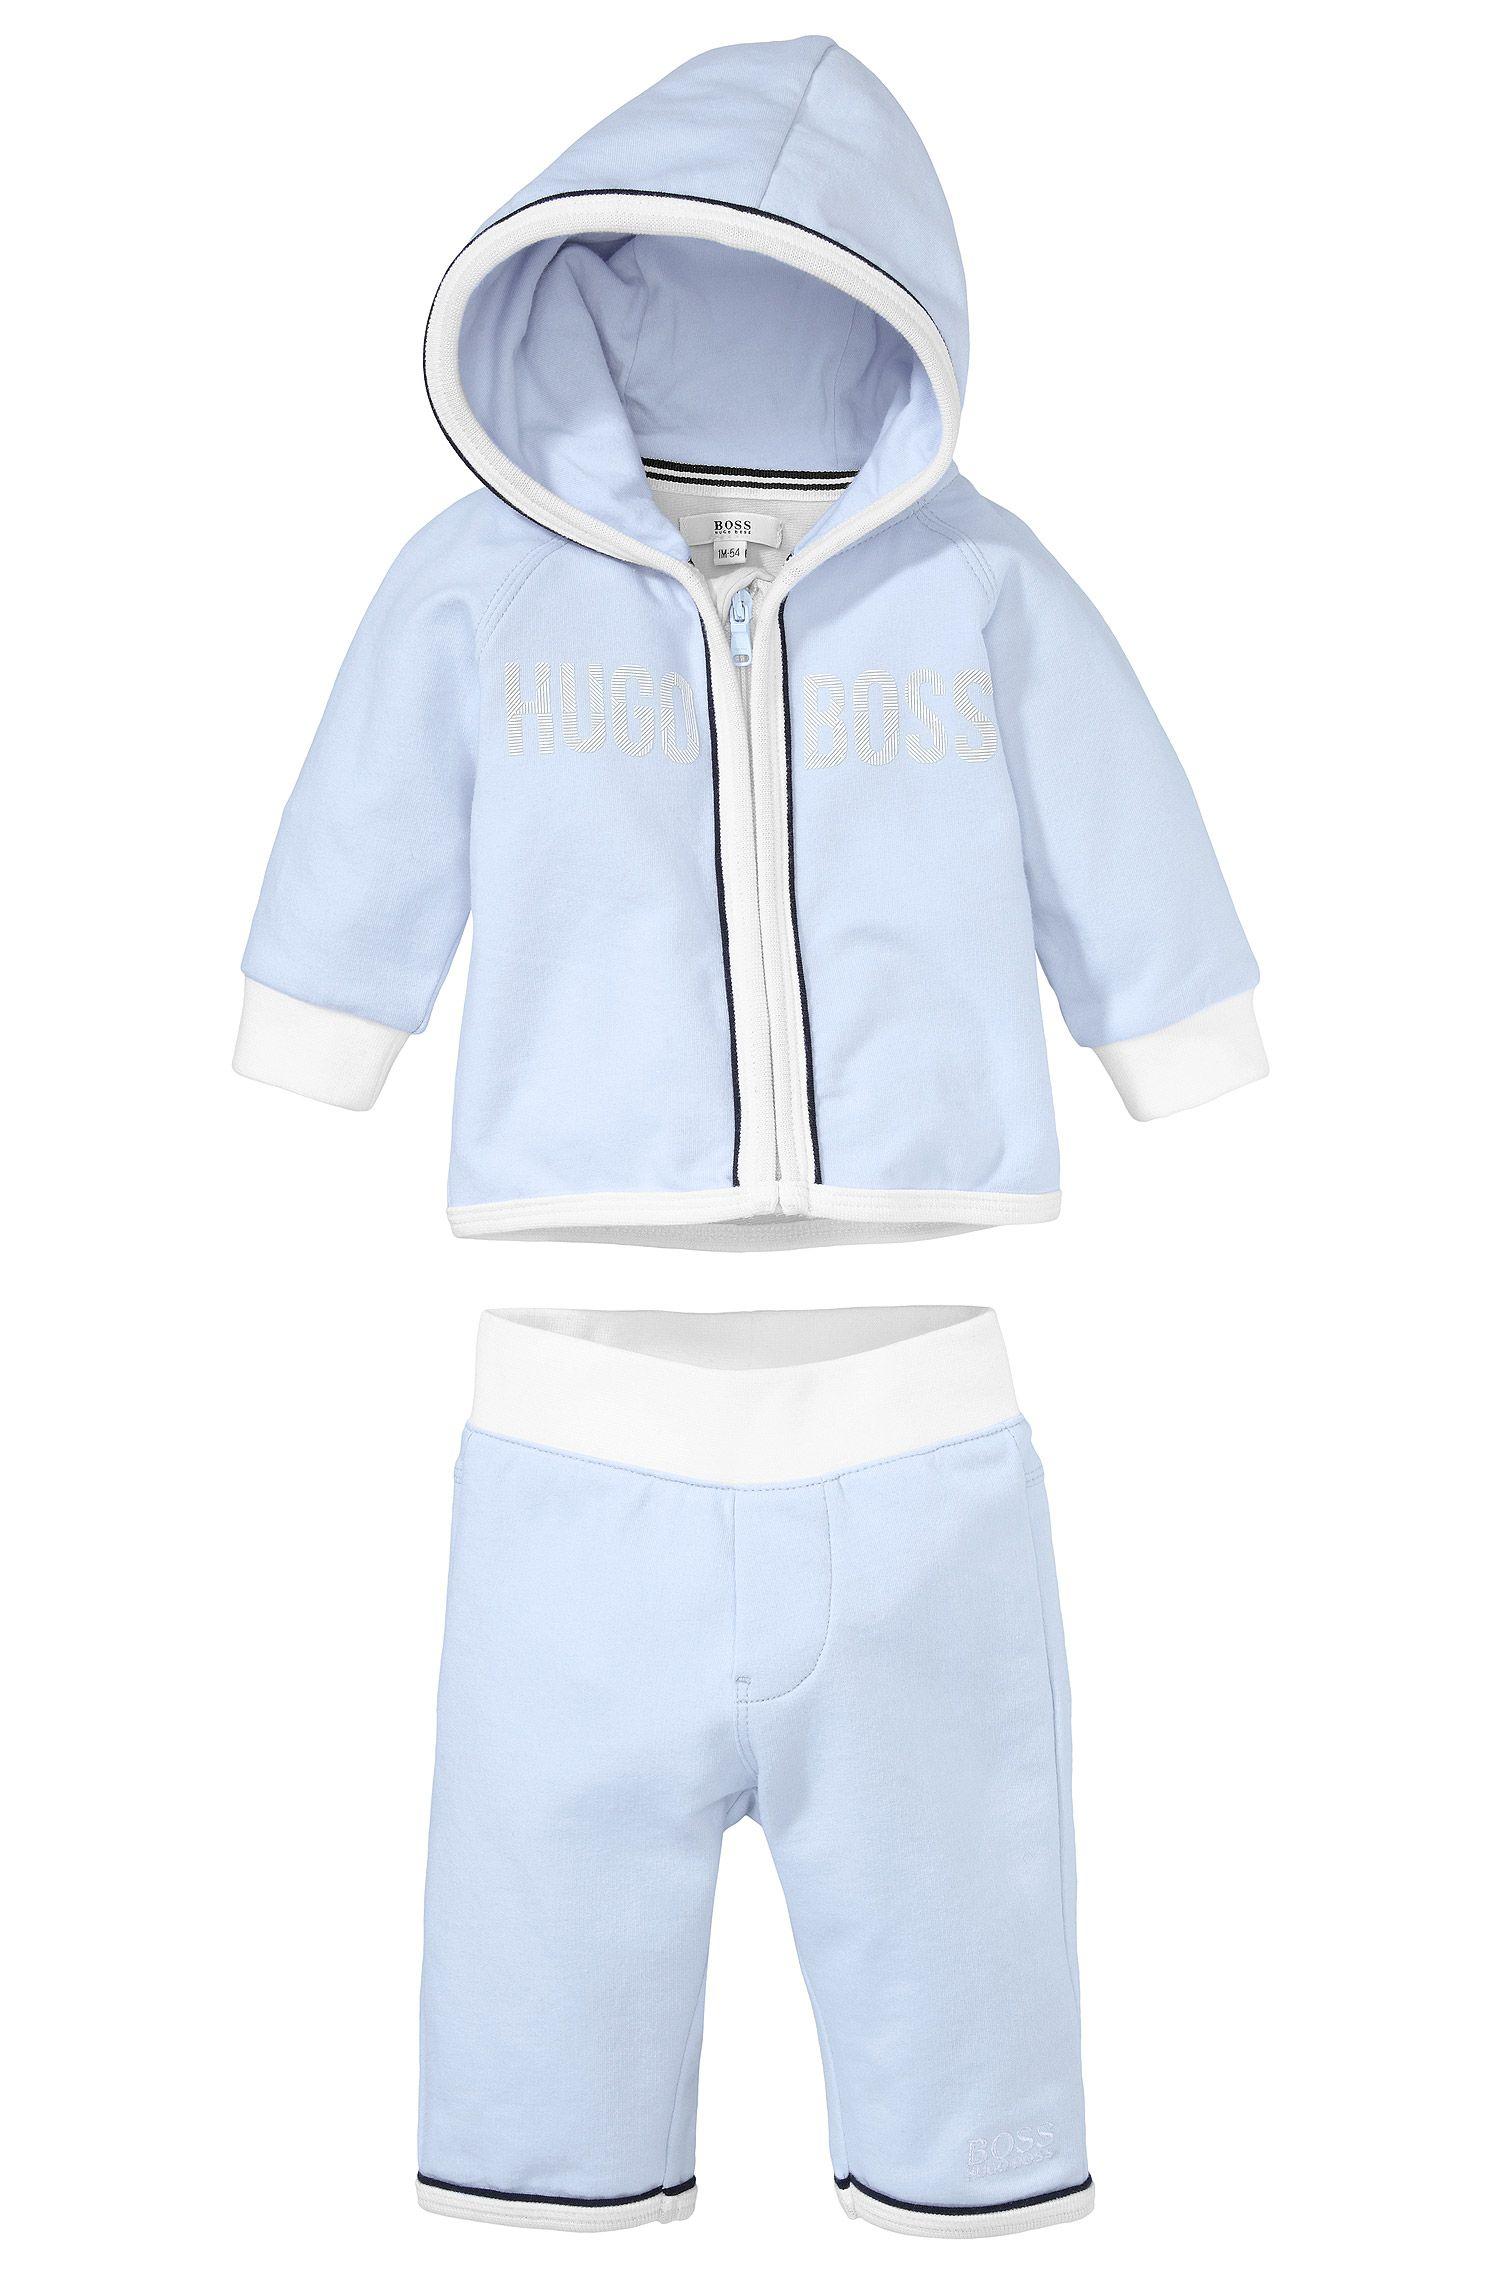 Kinderset met sweatshirtjas en joggingbroek 'J98122'